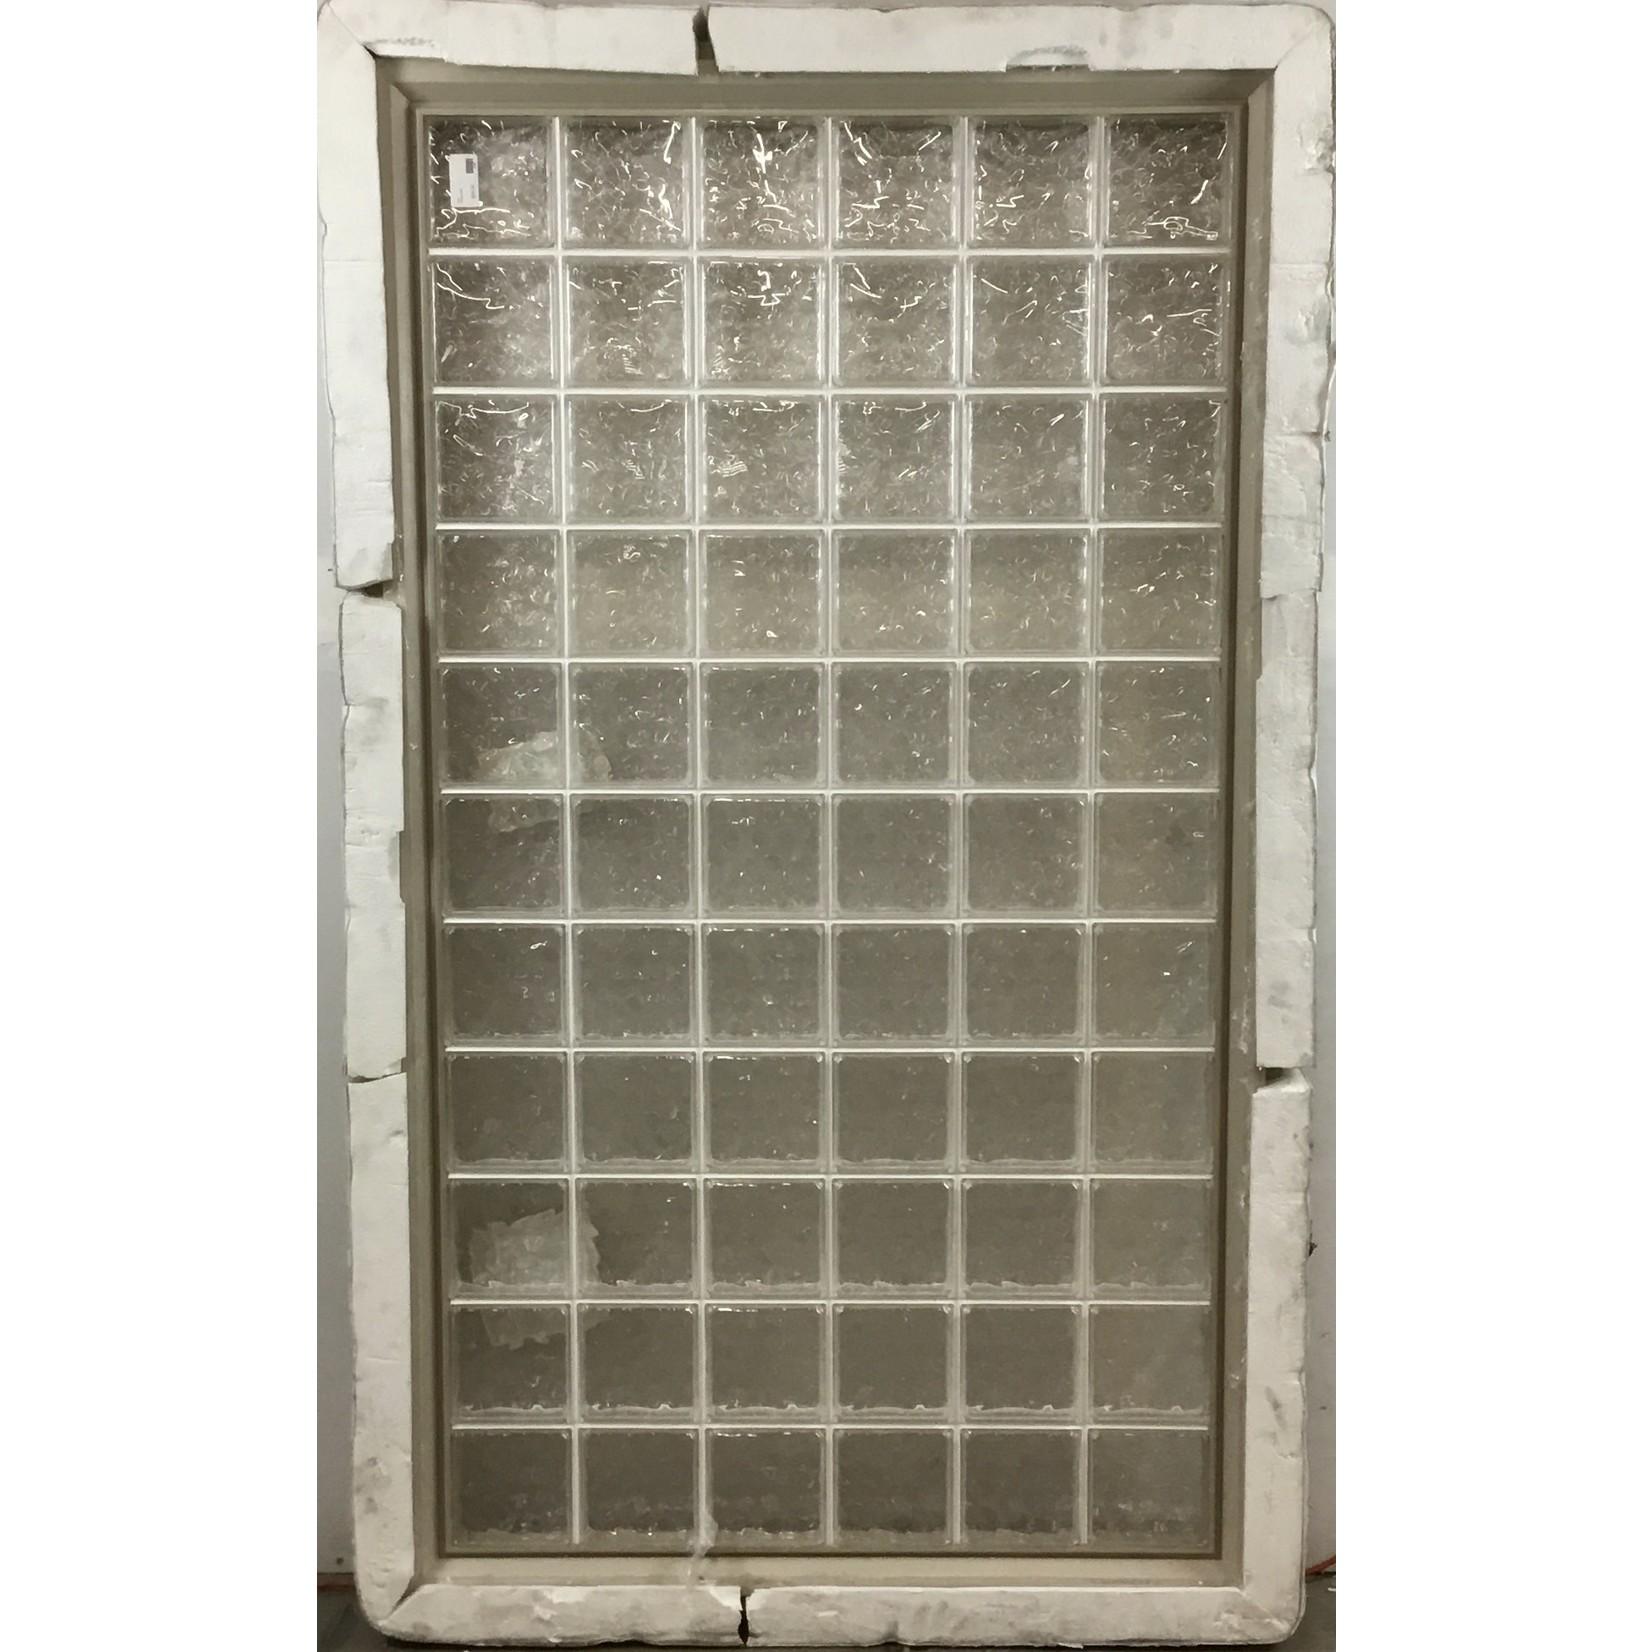 10487 Hy-Lite Design Block Window